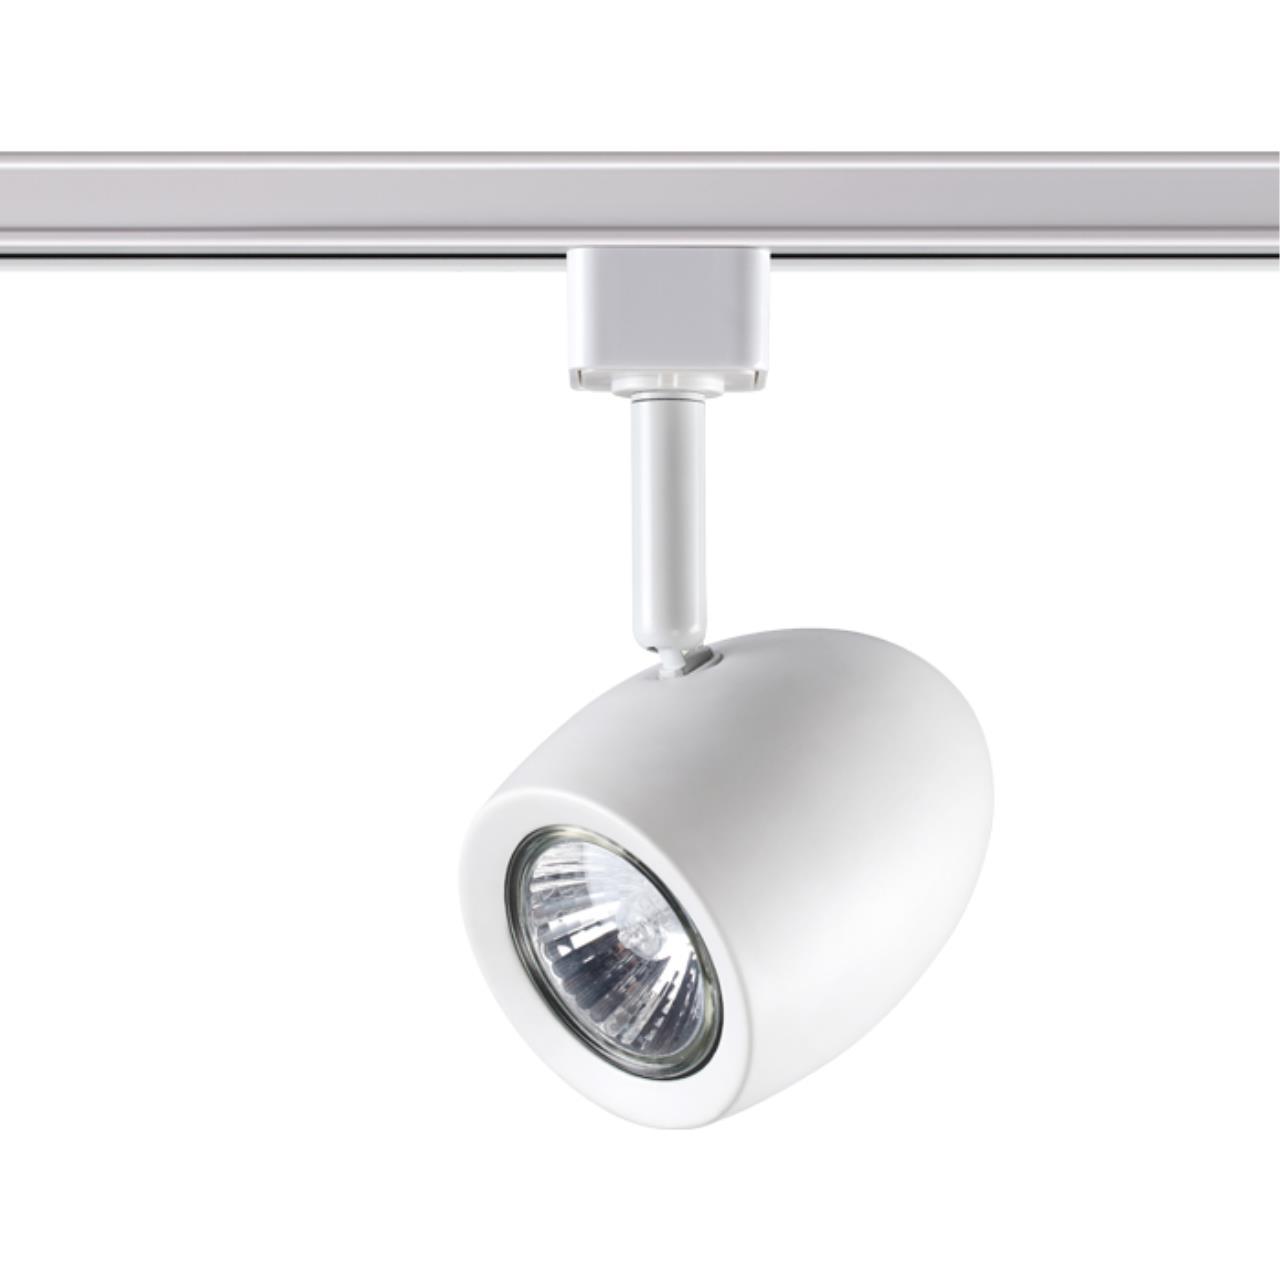 370546 PORT NT19 105 белый Трековый светильник IP20 GU10 50W 230V VETERUM